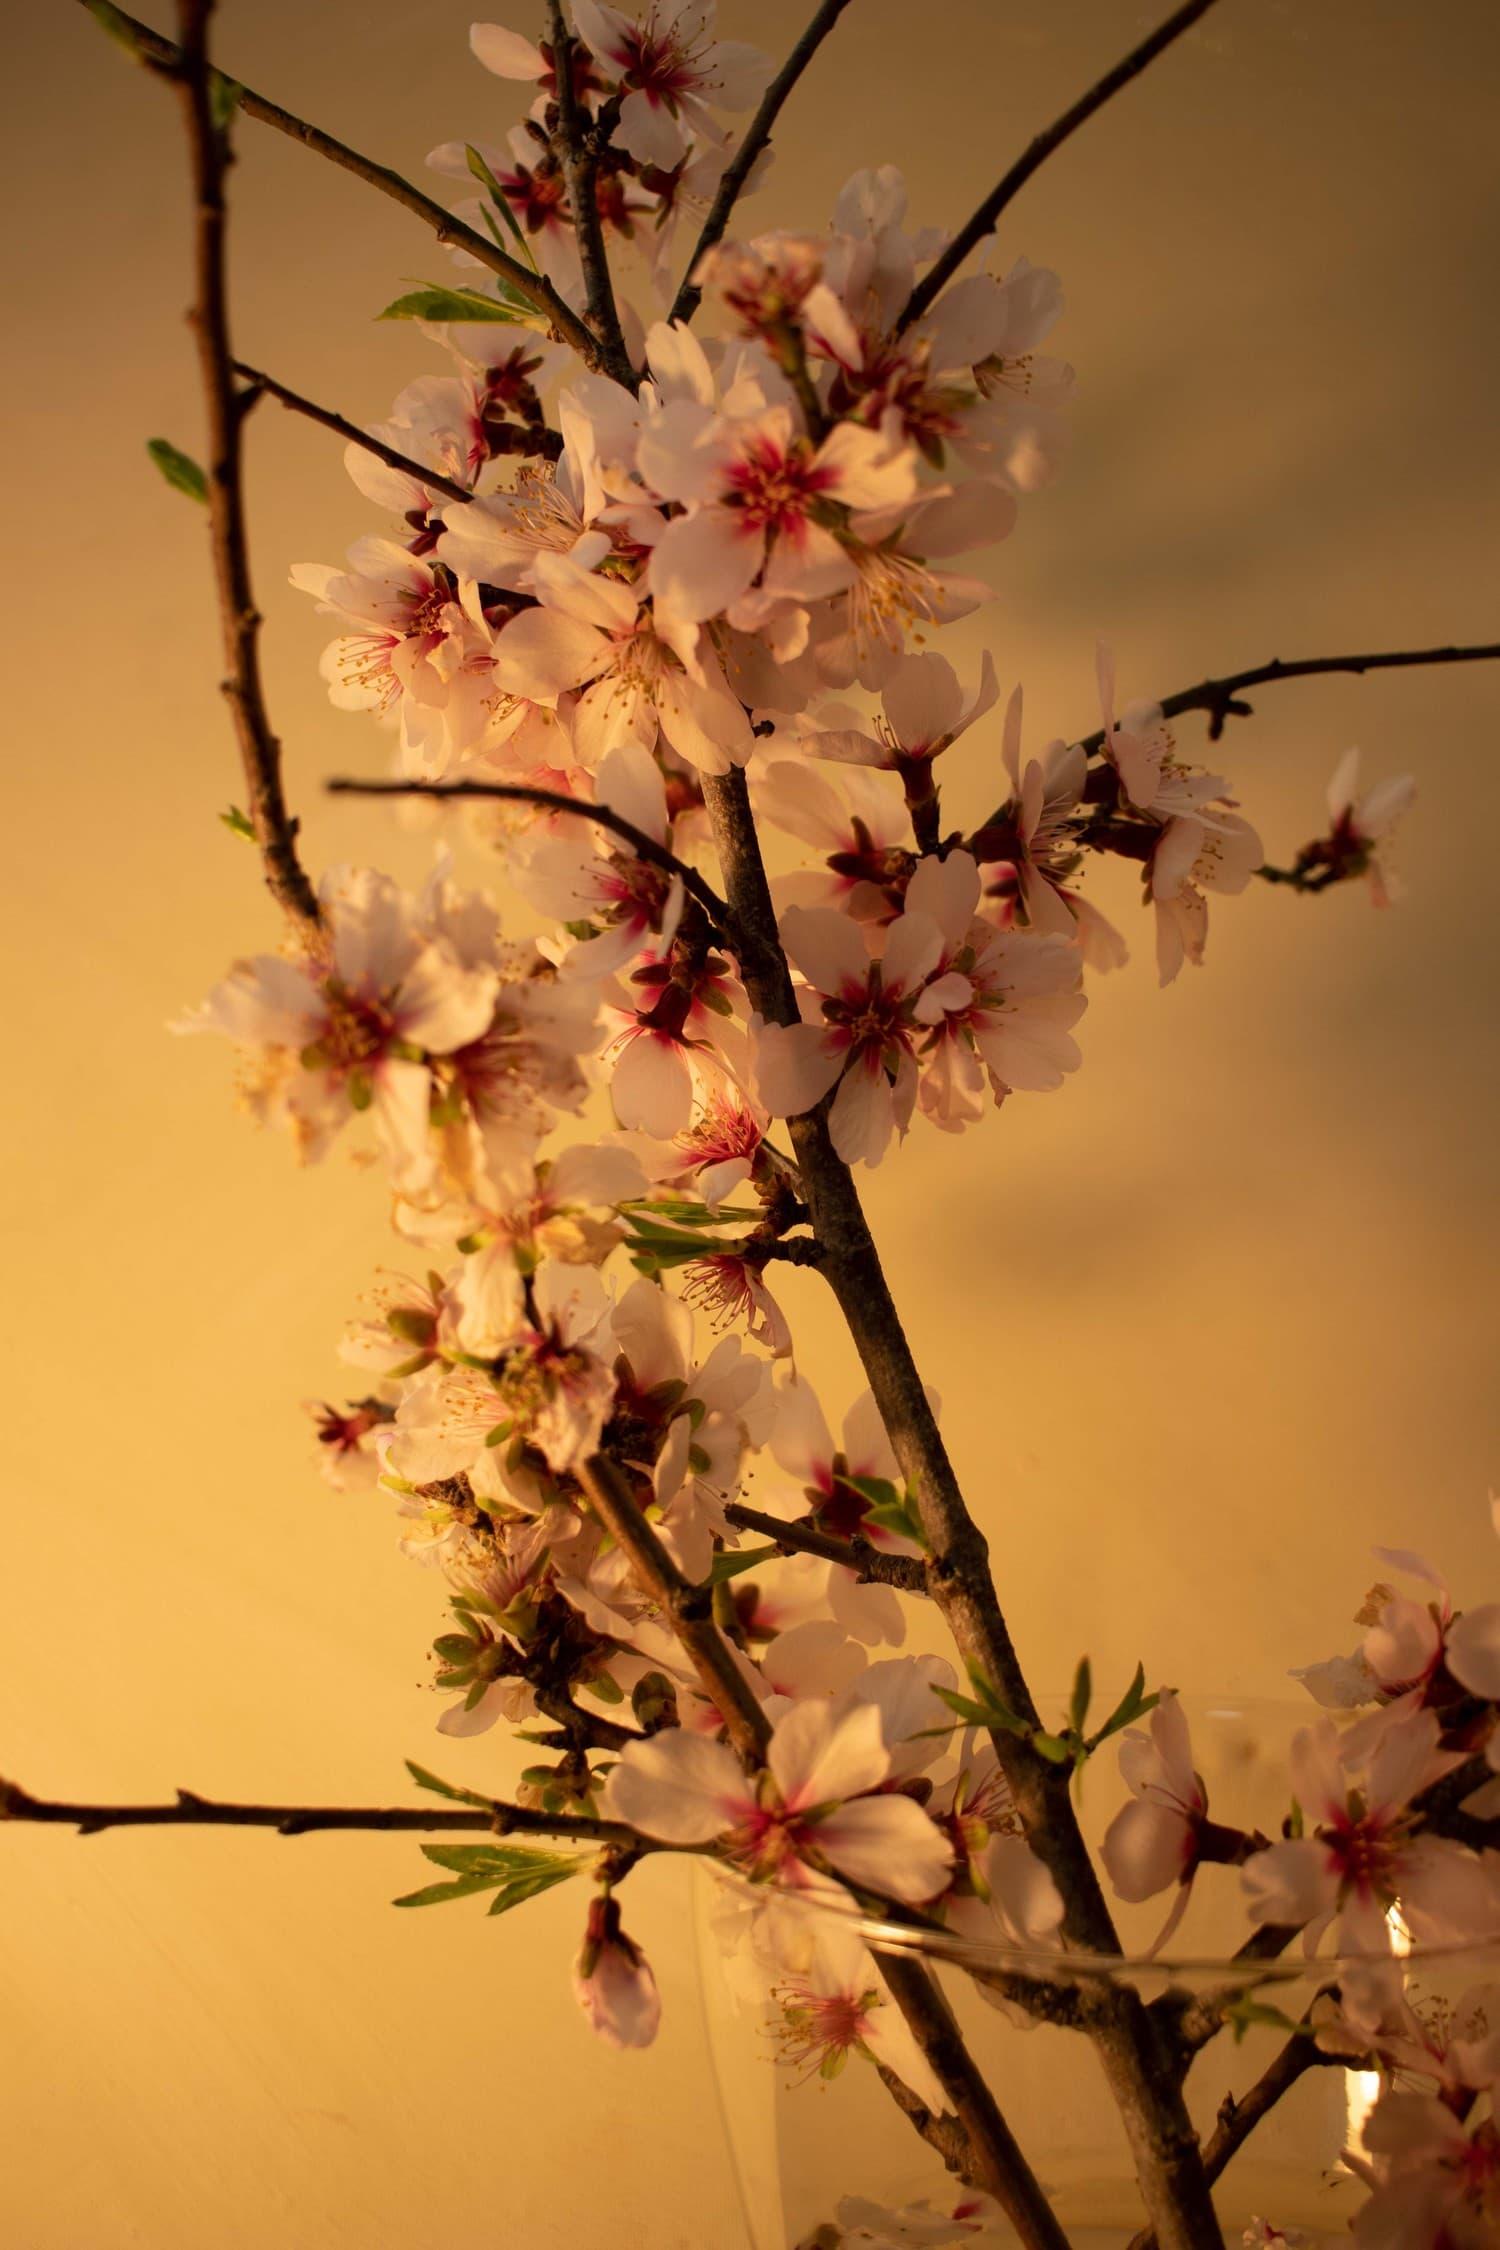 Flores con temperatura de luz cálida